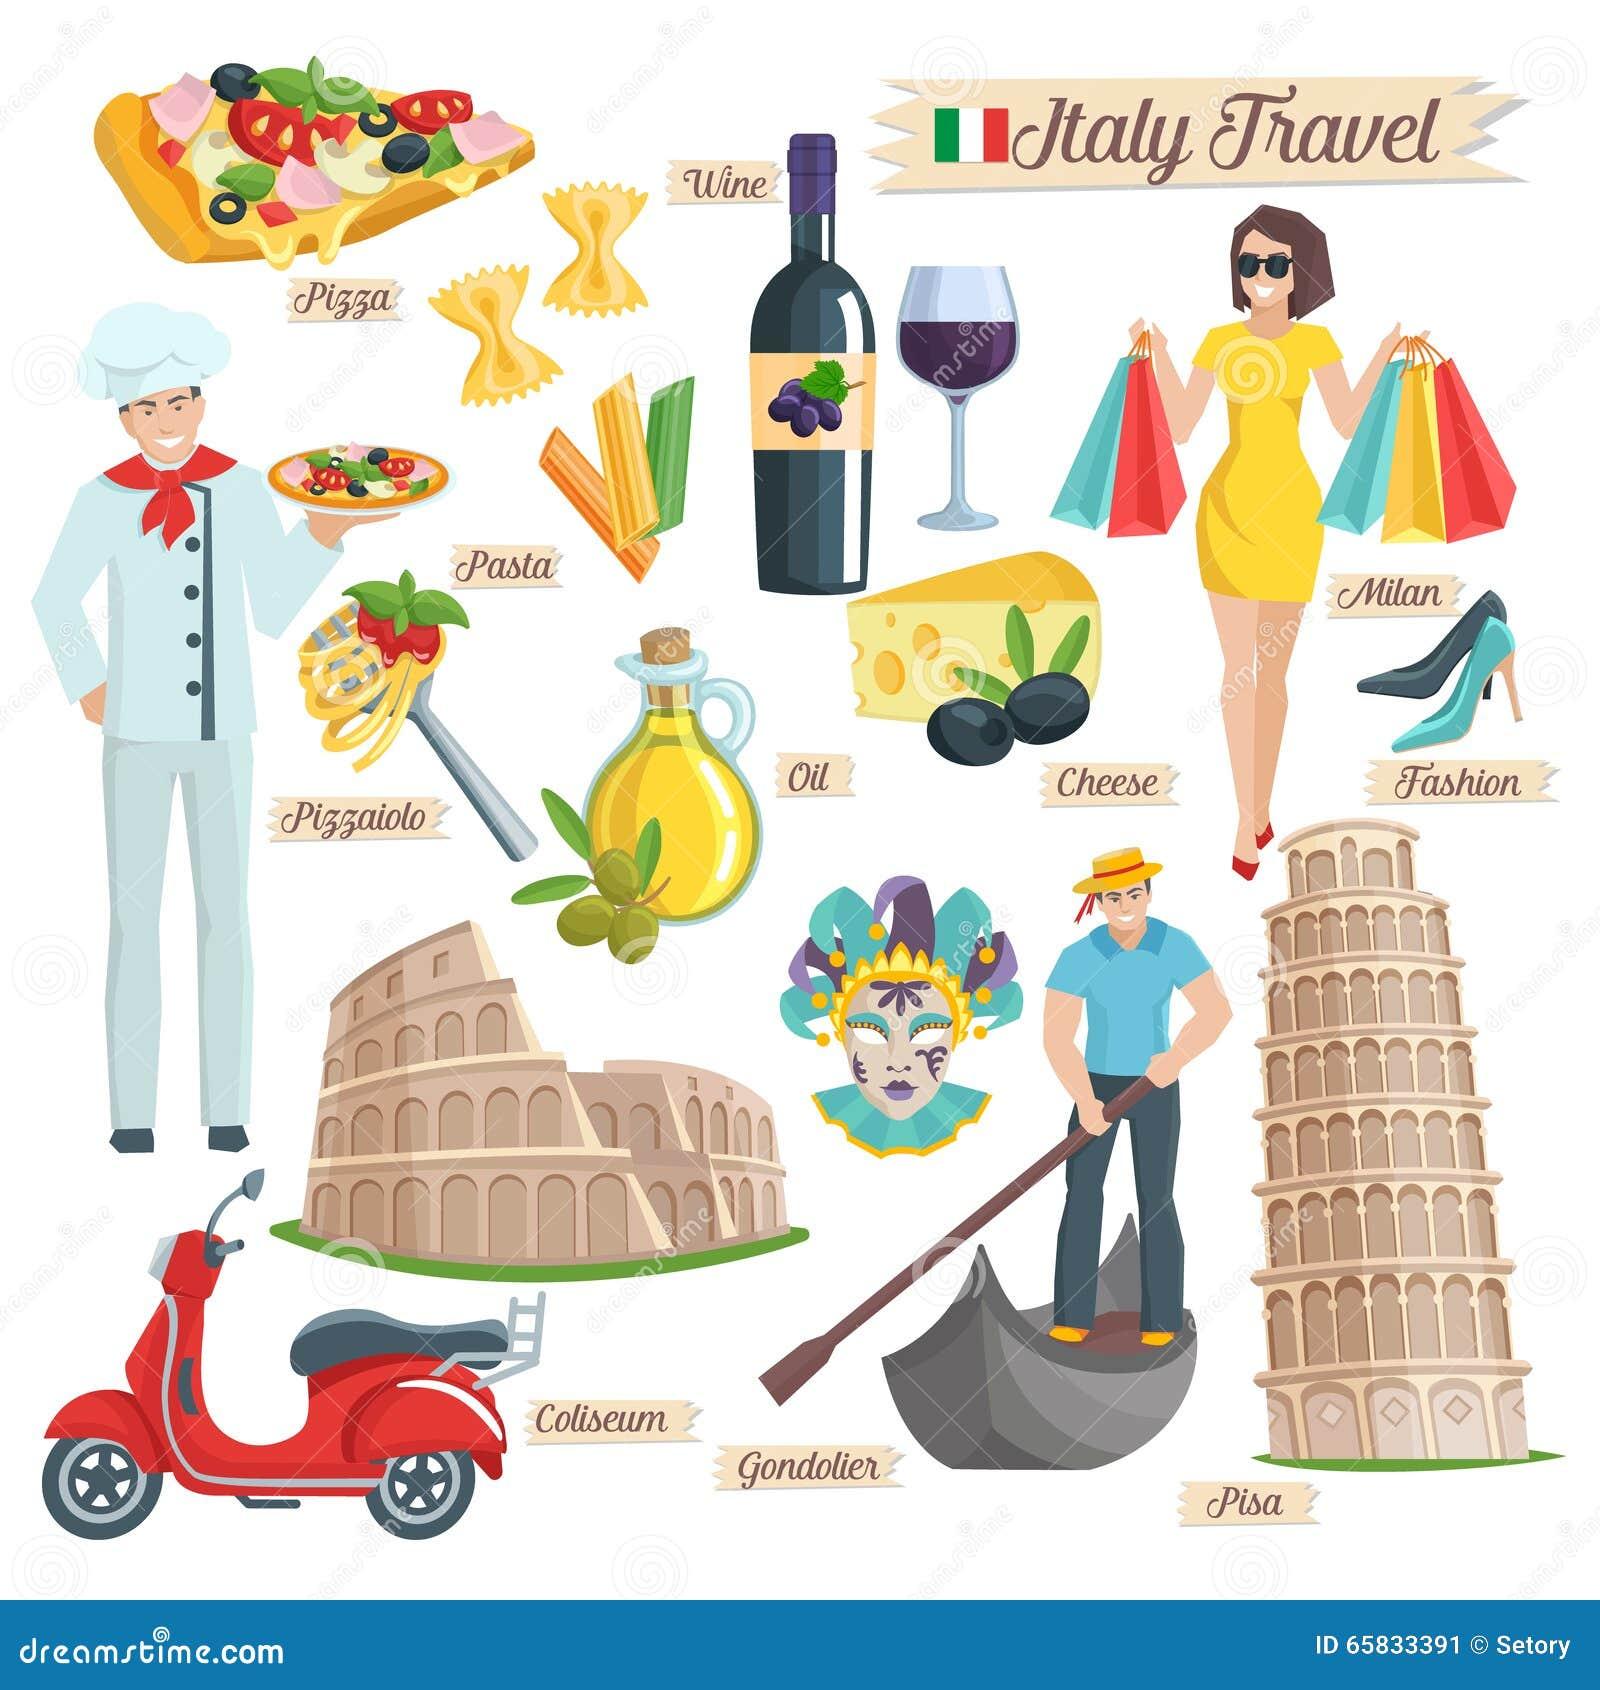 Clothes vocabulary in italian